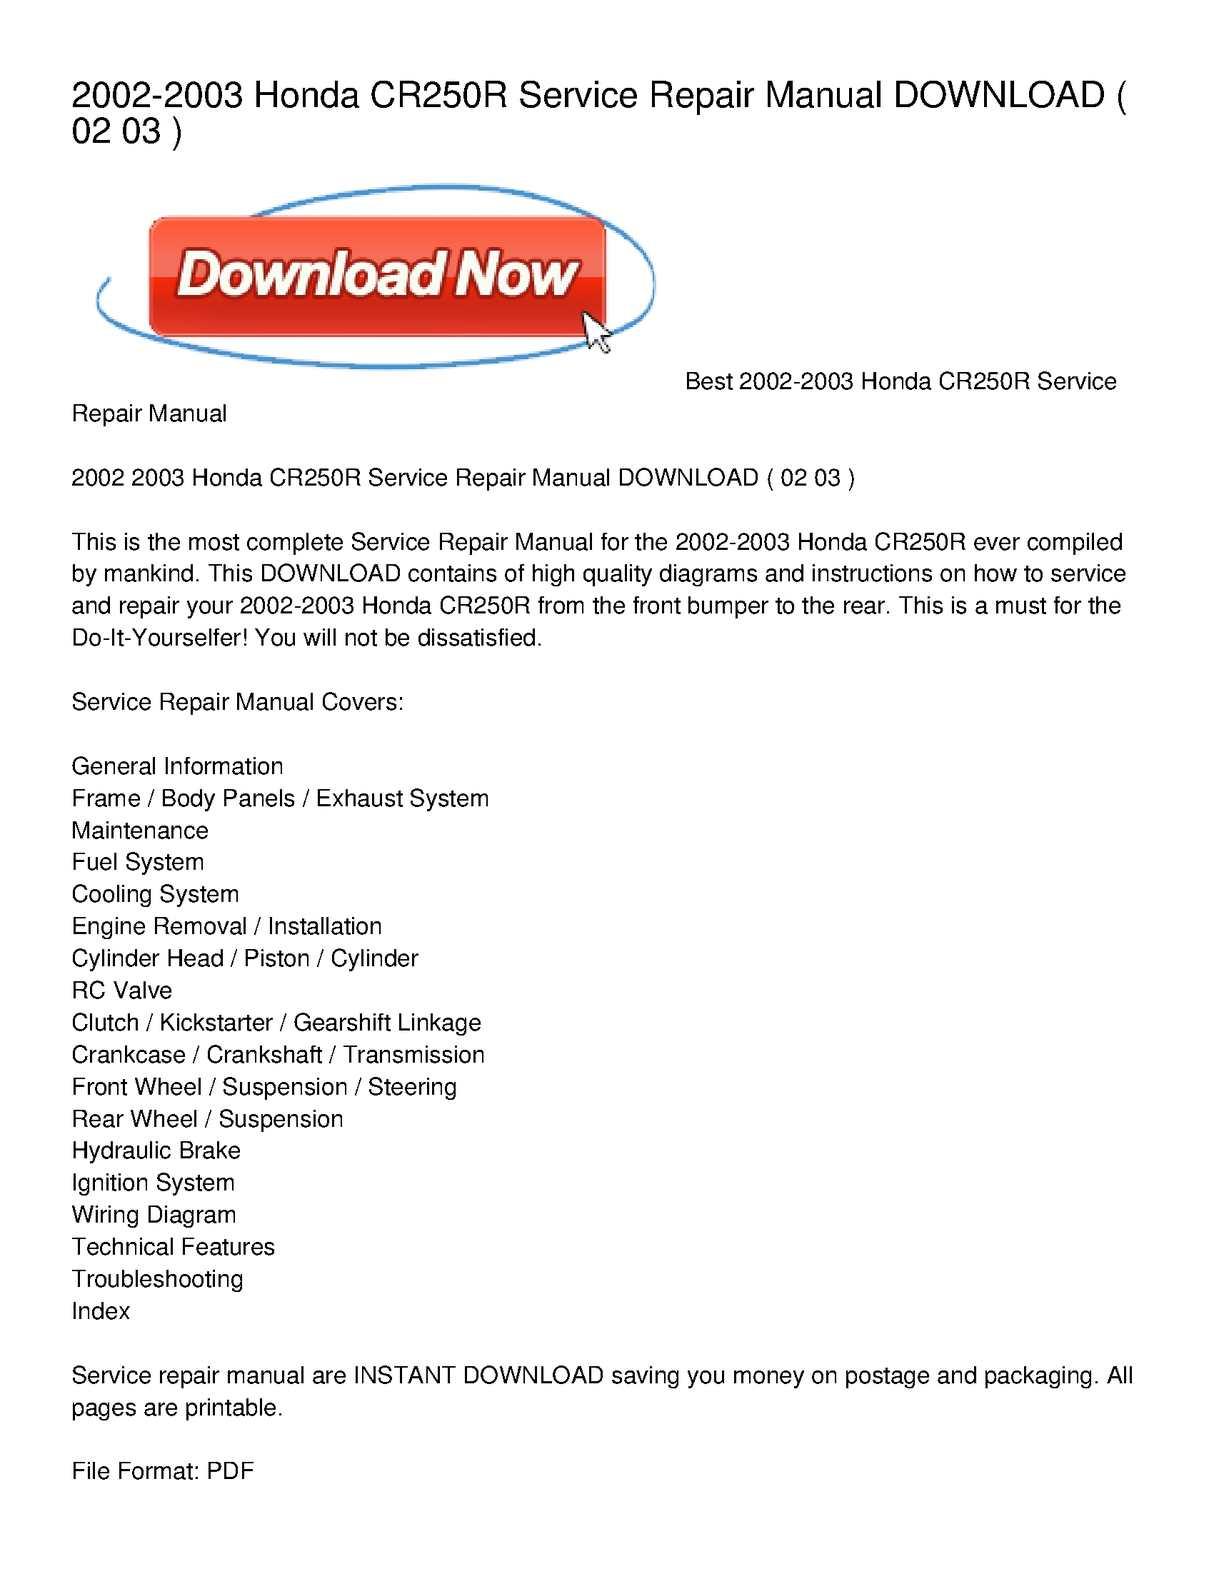 cr250 manual free download